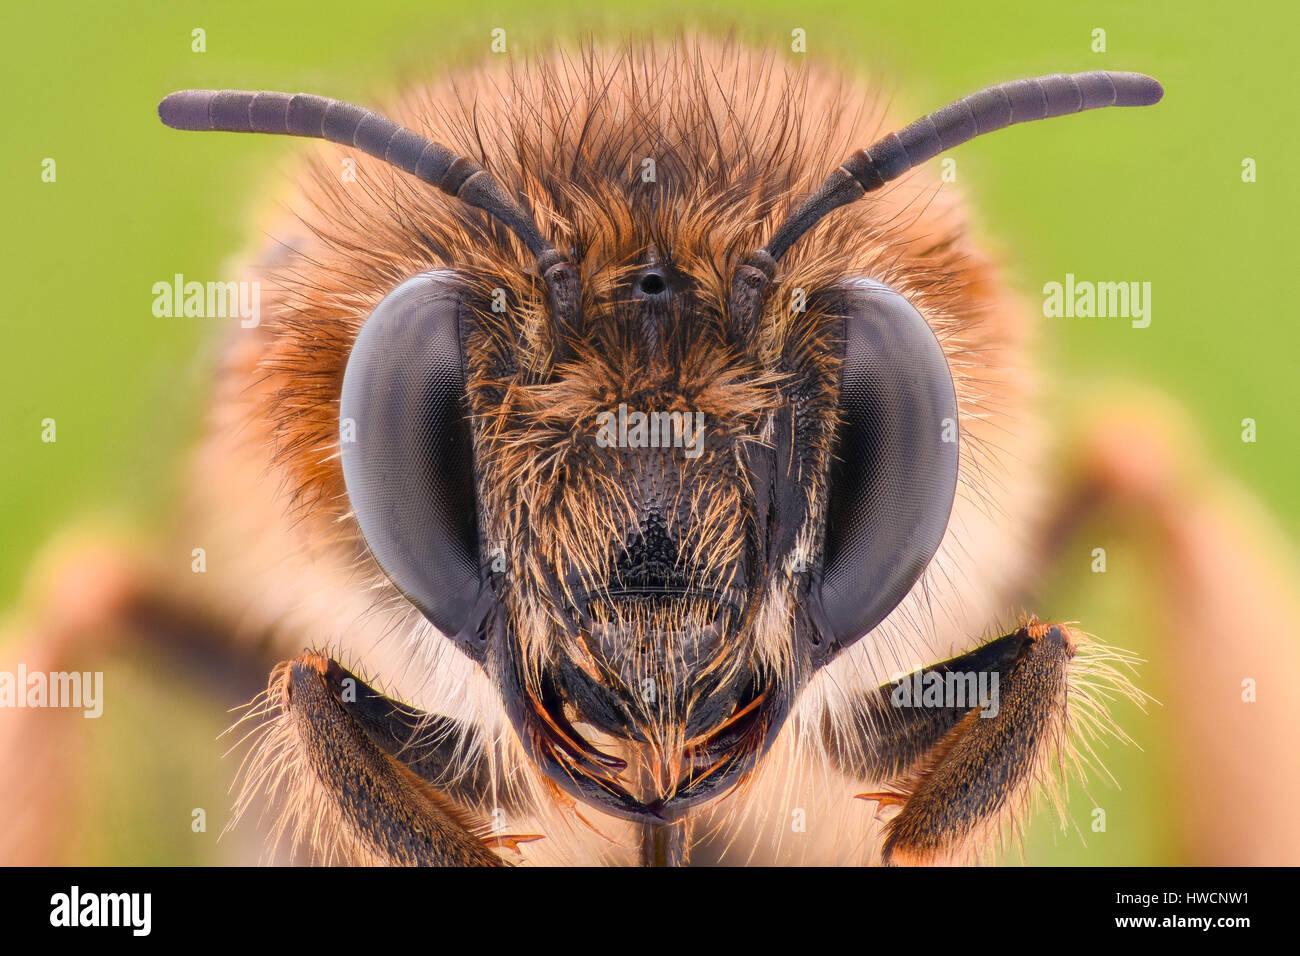 Extreme magnification - Honey Bee Stock Photo